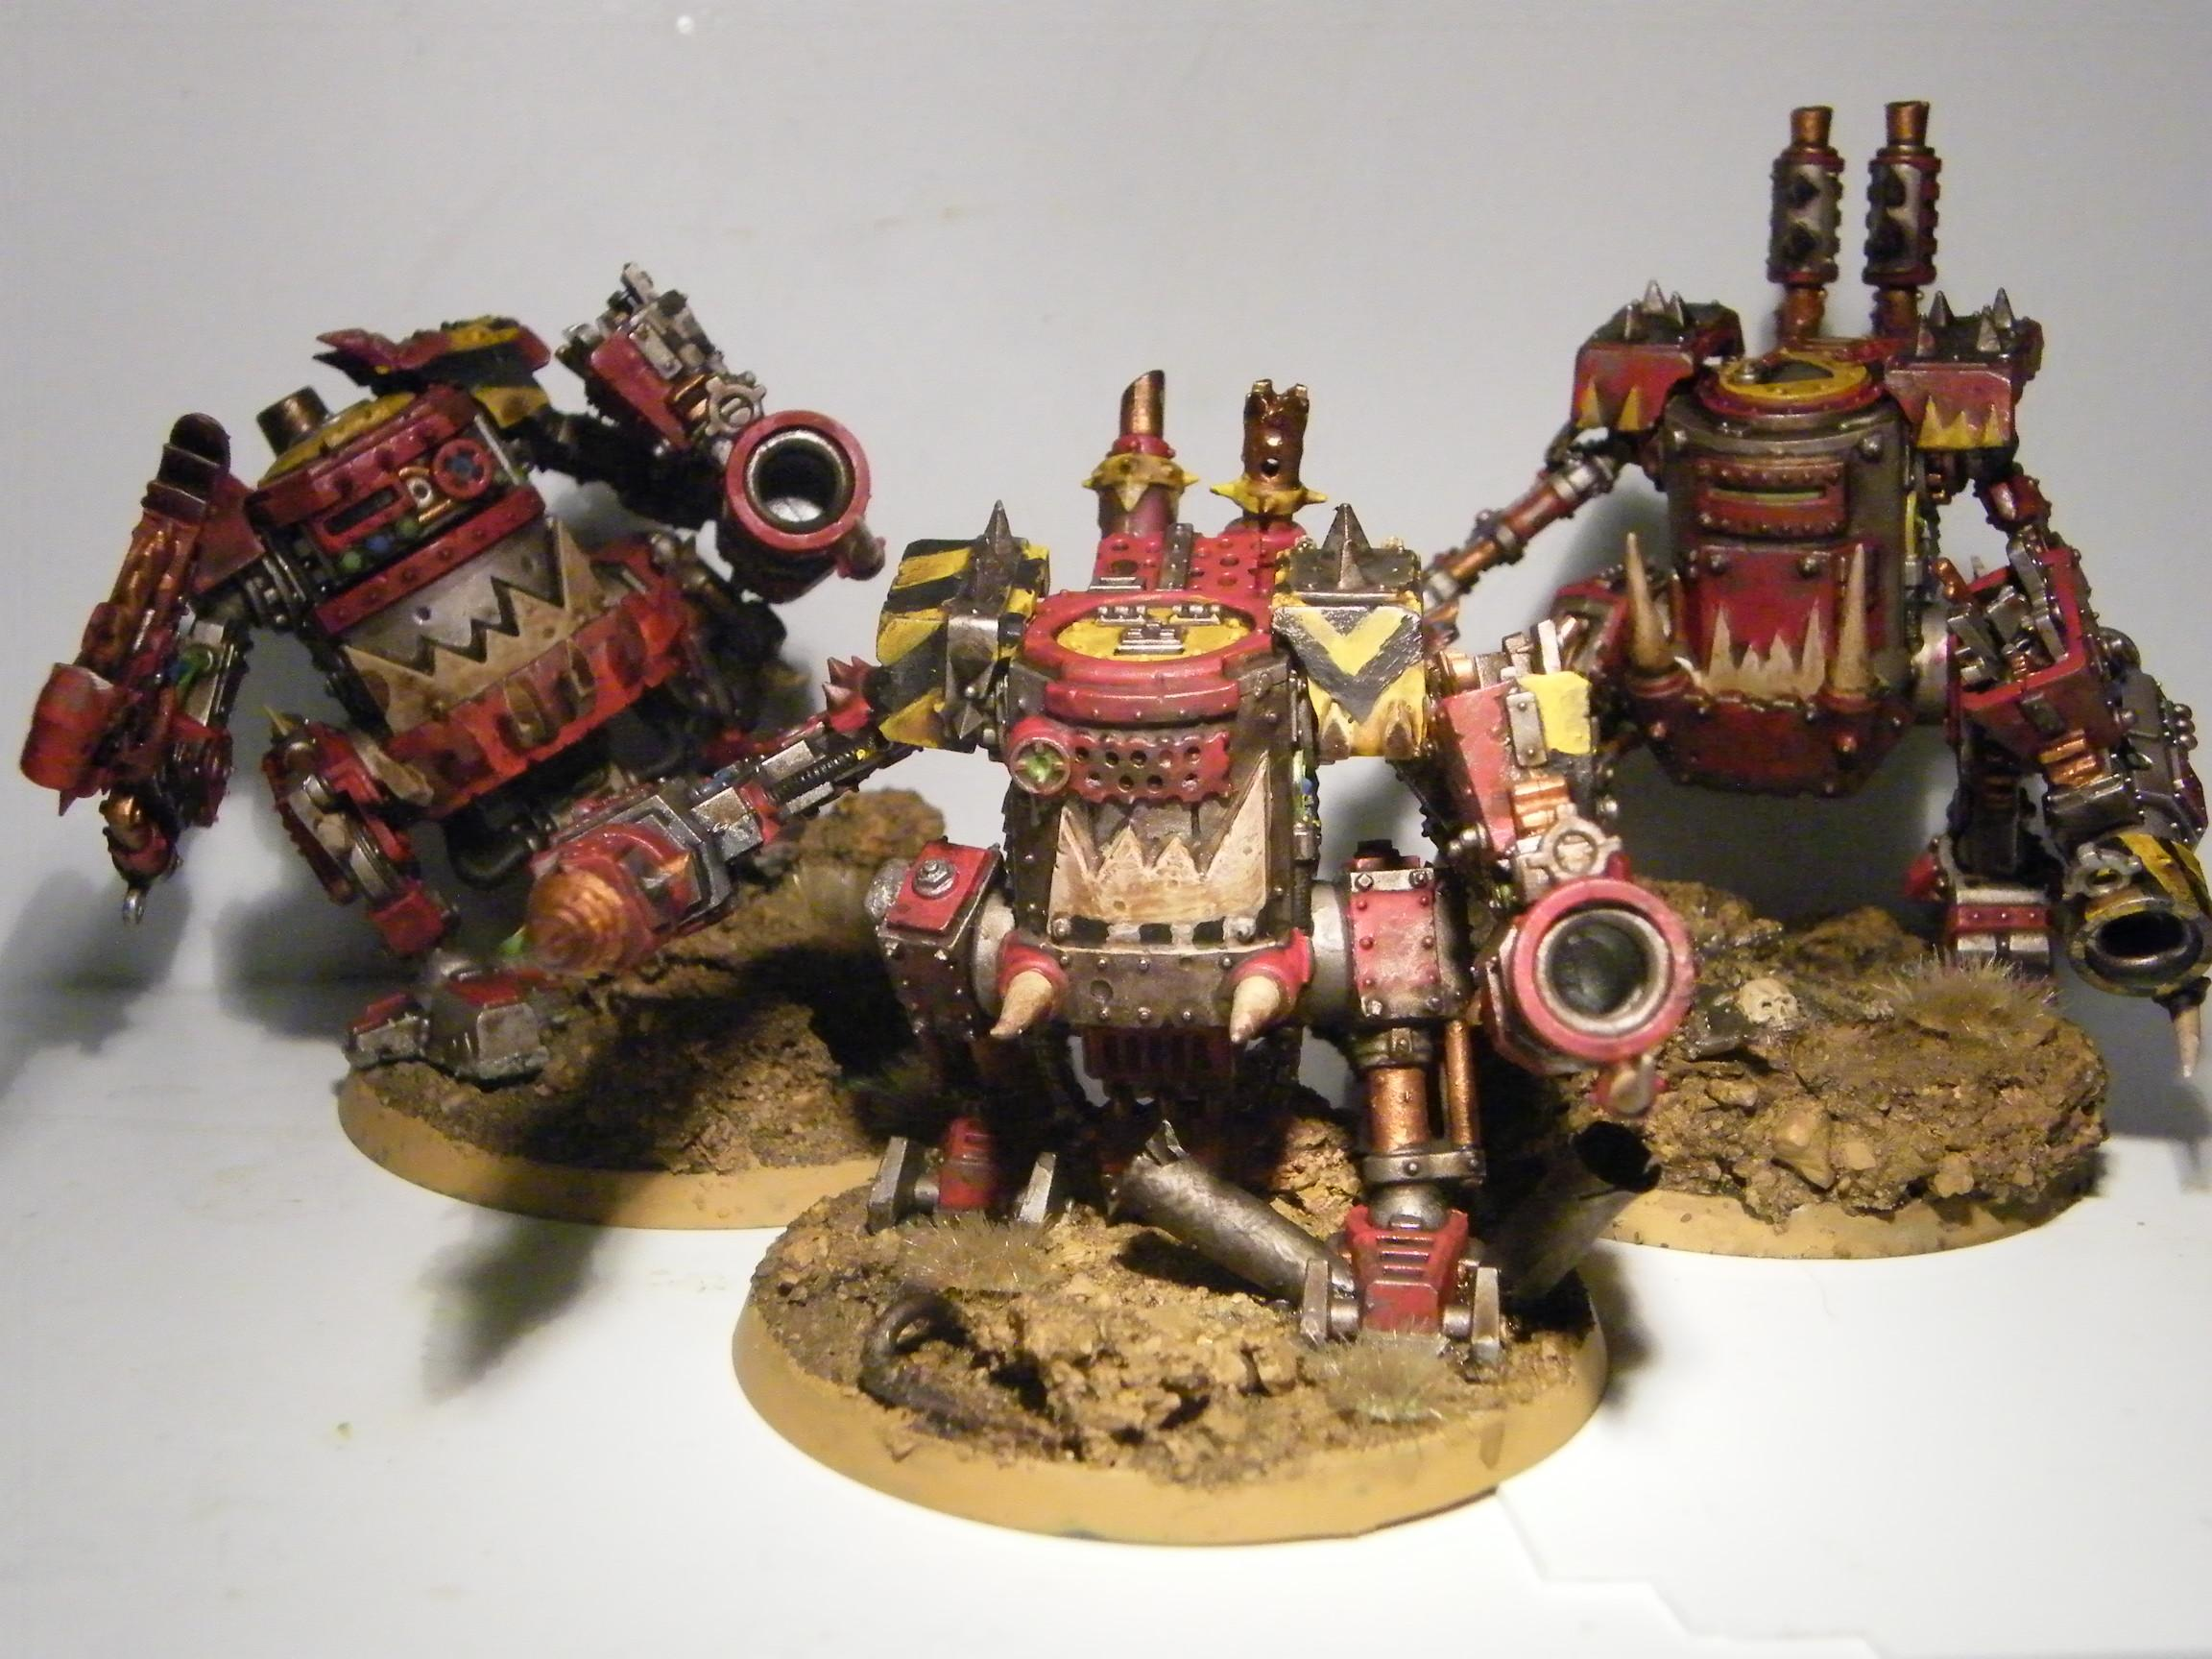 Grots, Heavy, Killa Kan, Mech Walker, Ork Kan Killa Killakan Heavy Support Mech Walker, Orks, Support